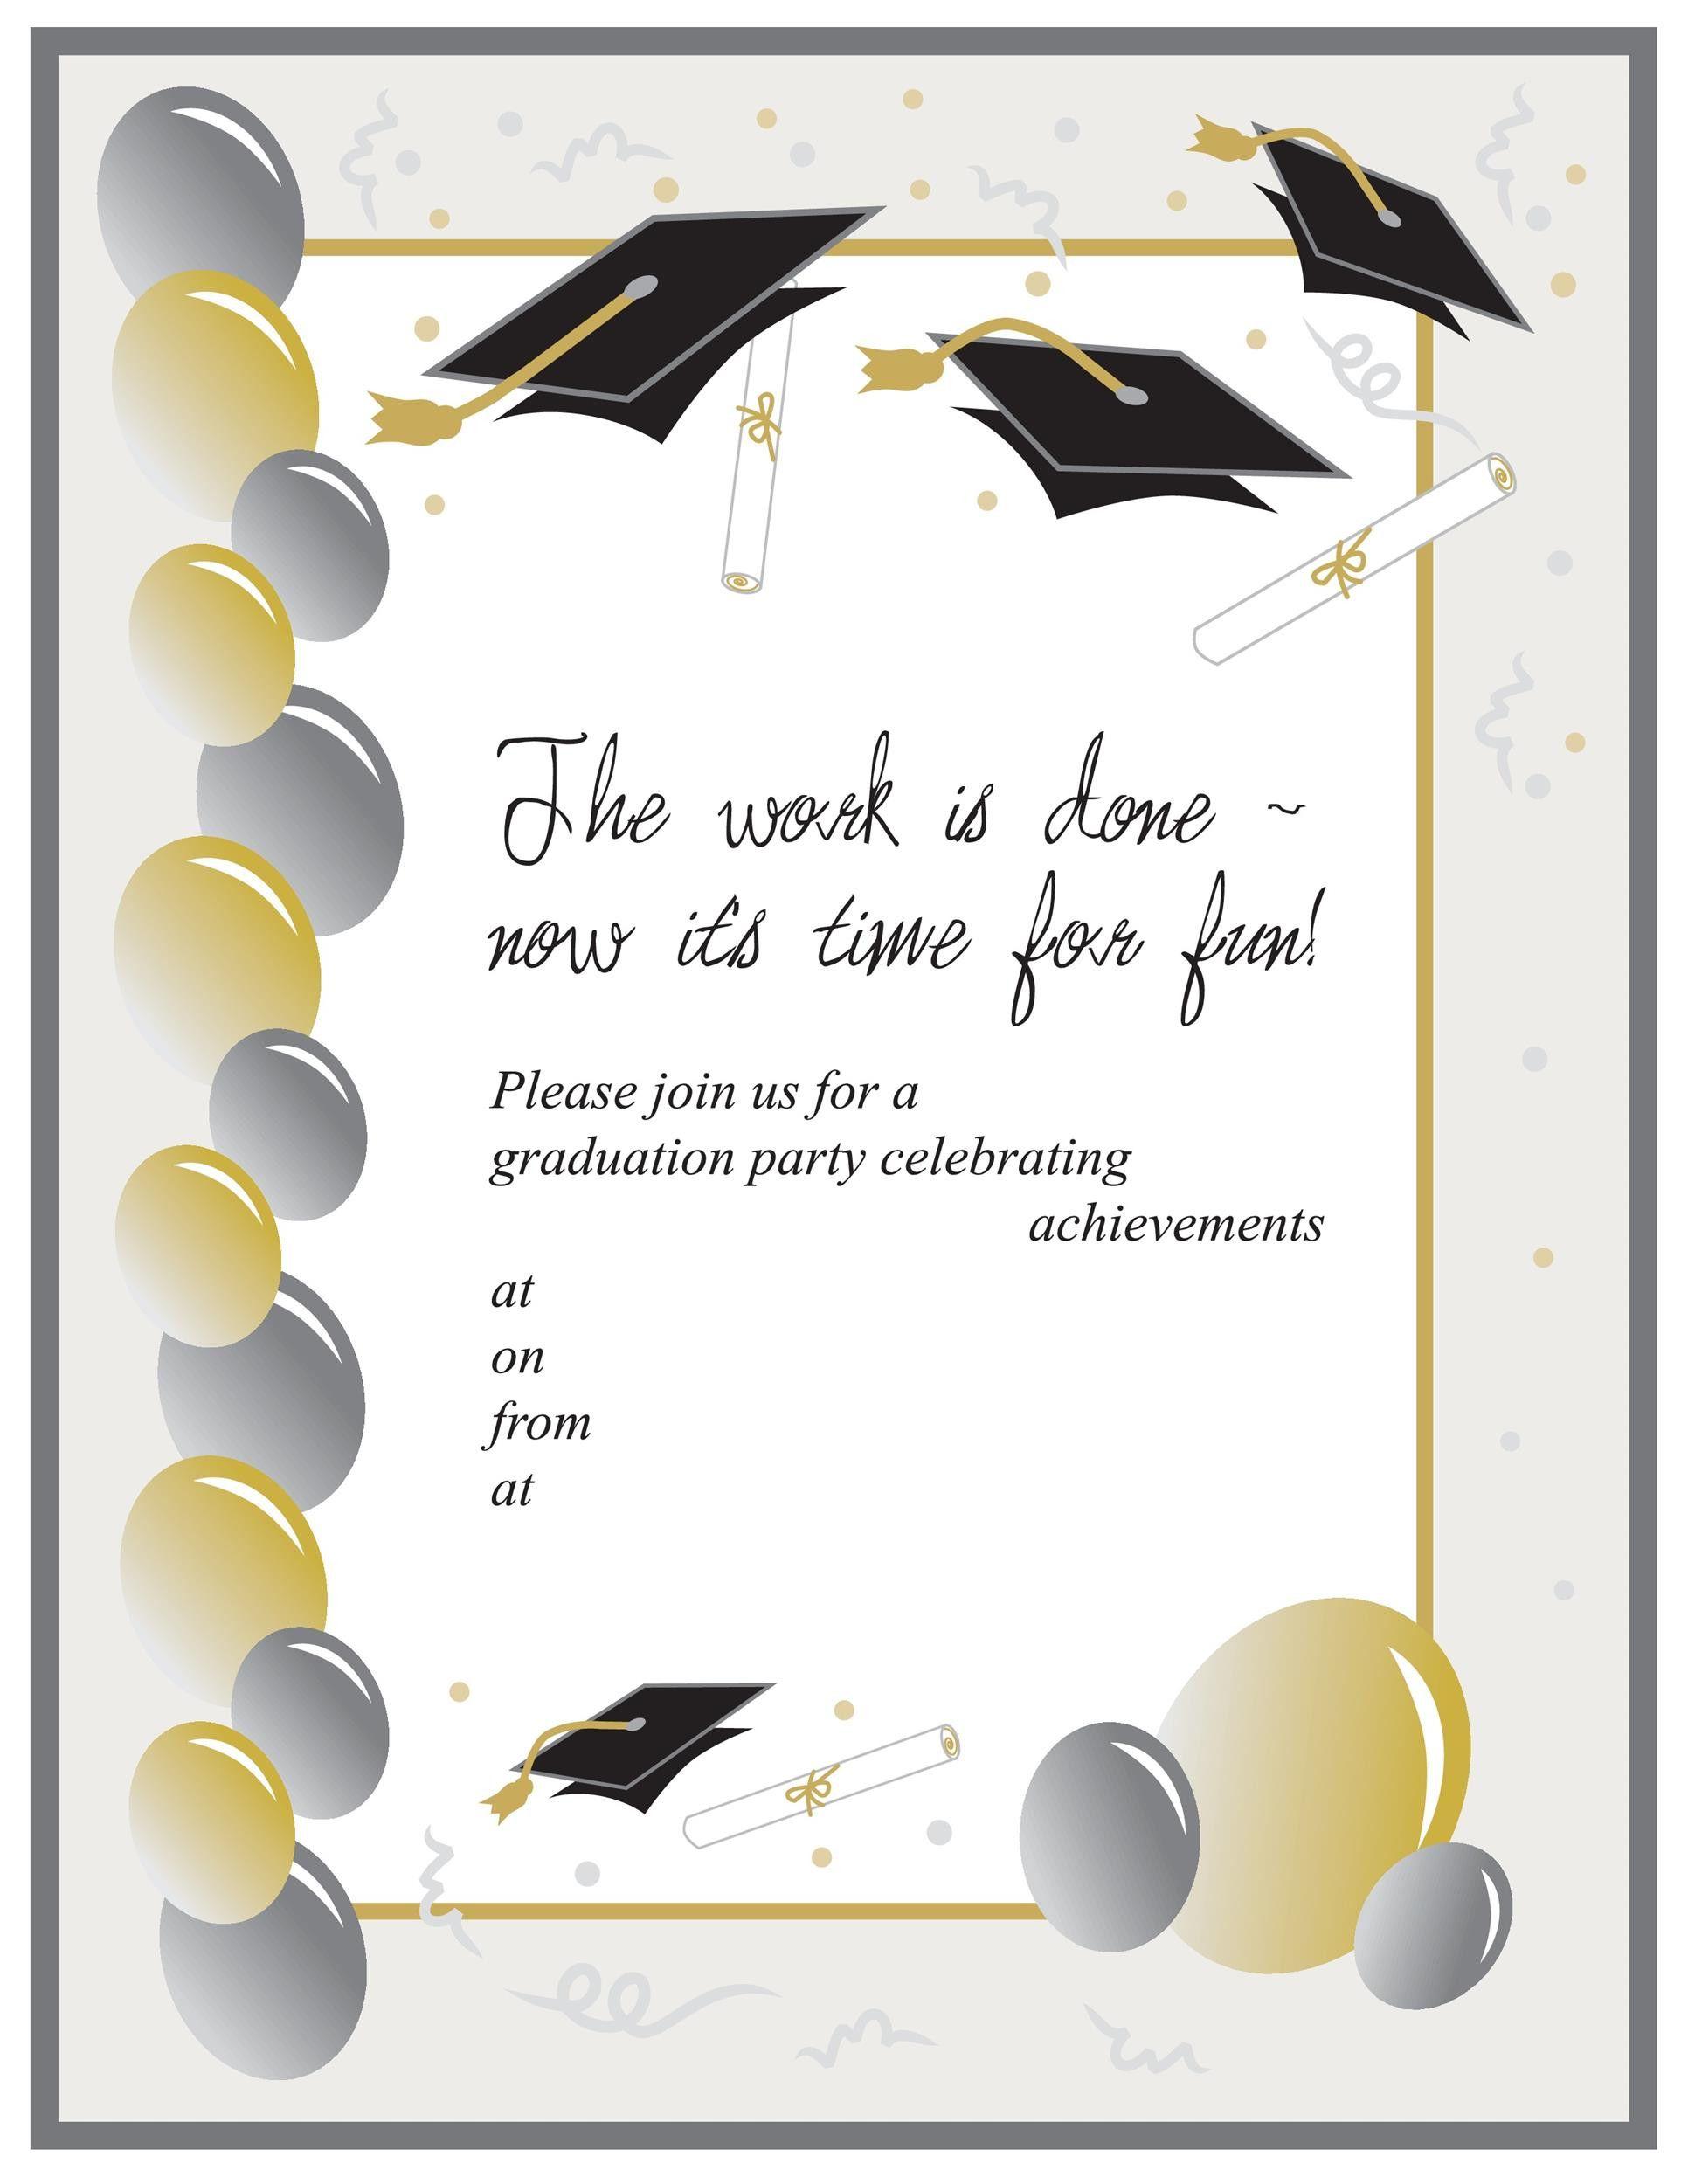 Graduation Ceremony Invitation Card Graduation Invitations Template Graduation Invitations Party Invite Template